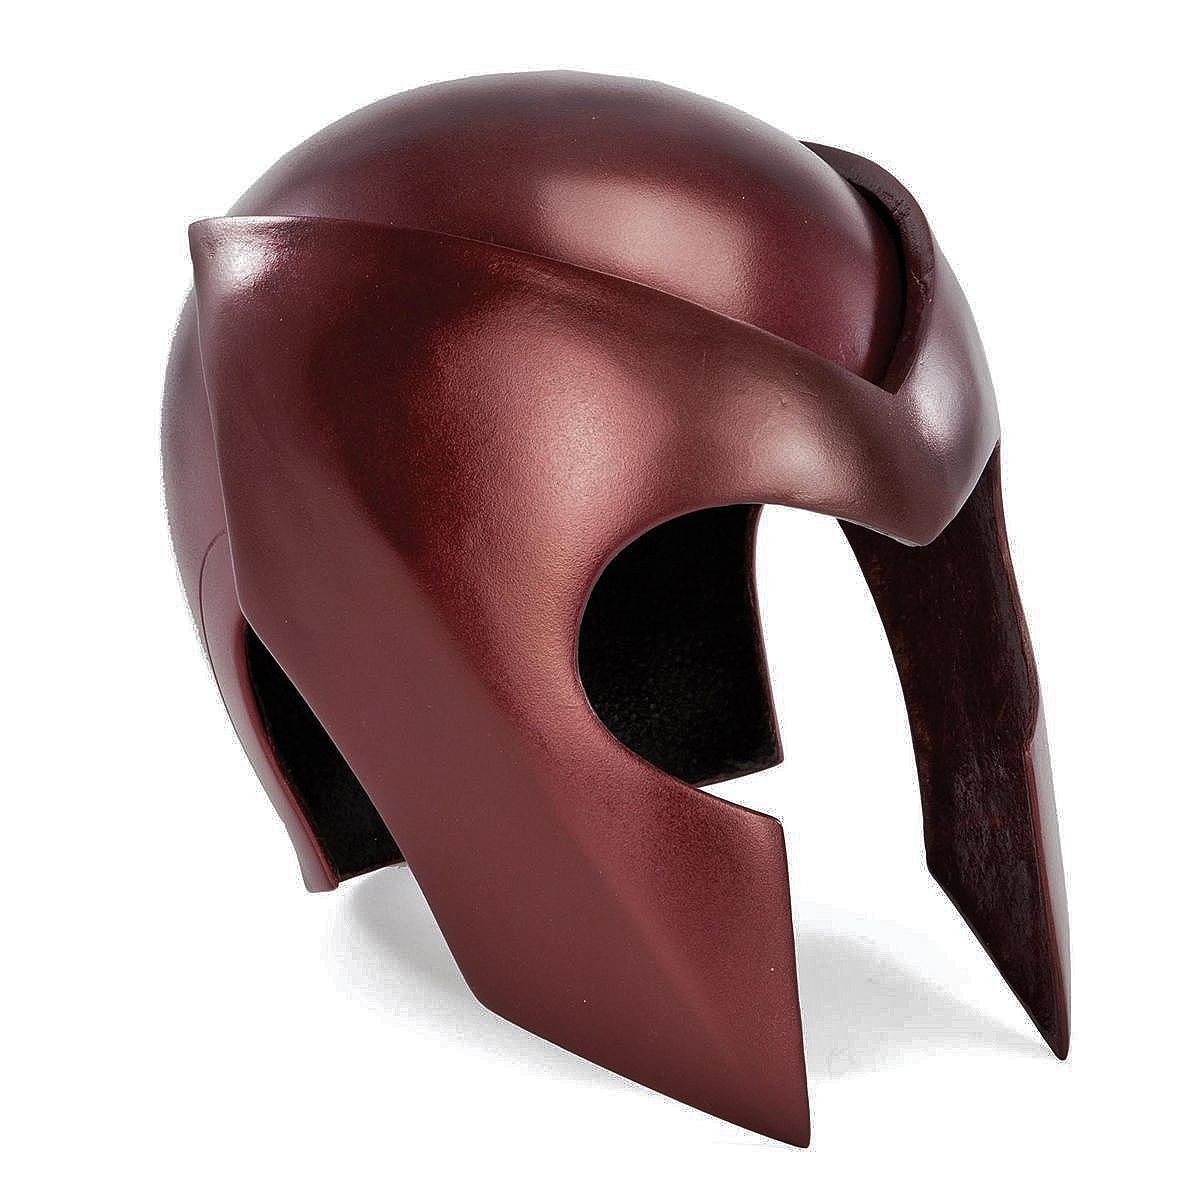 X Men The Last Stand Colossus Magneto's Helmet   X-M...